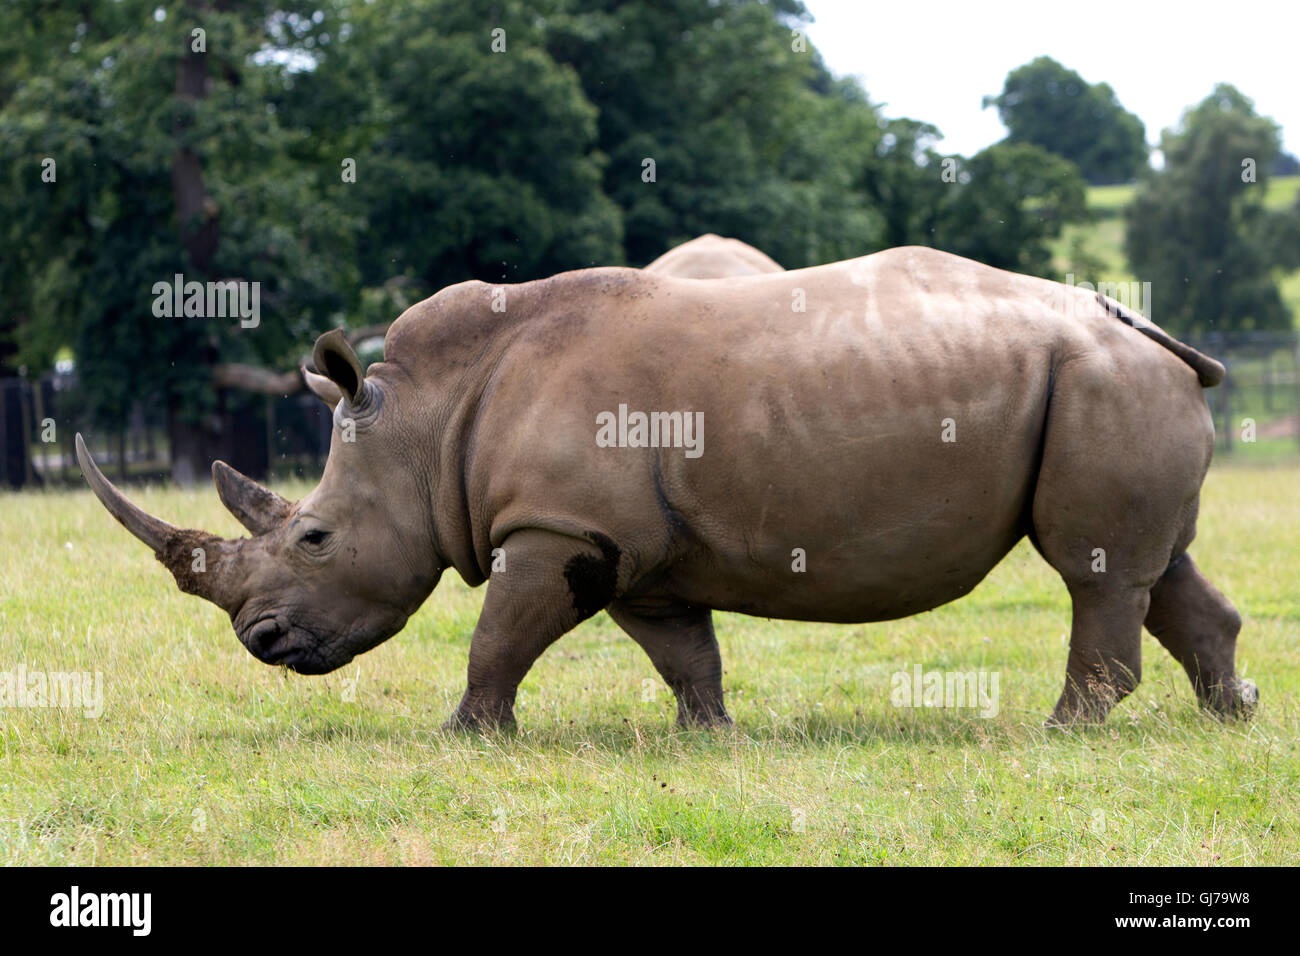 Southern White Rhino rhinoceros famiglia Ceratotherium simum simum at Woburn Safari Park a Woburn, Bedfordshire, Immagini Stock